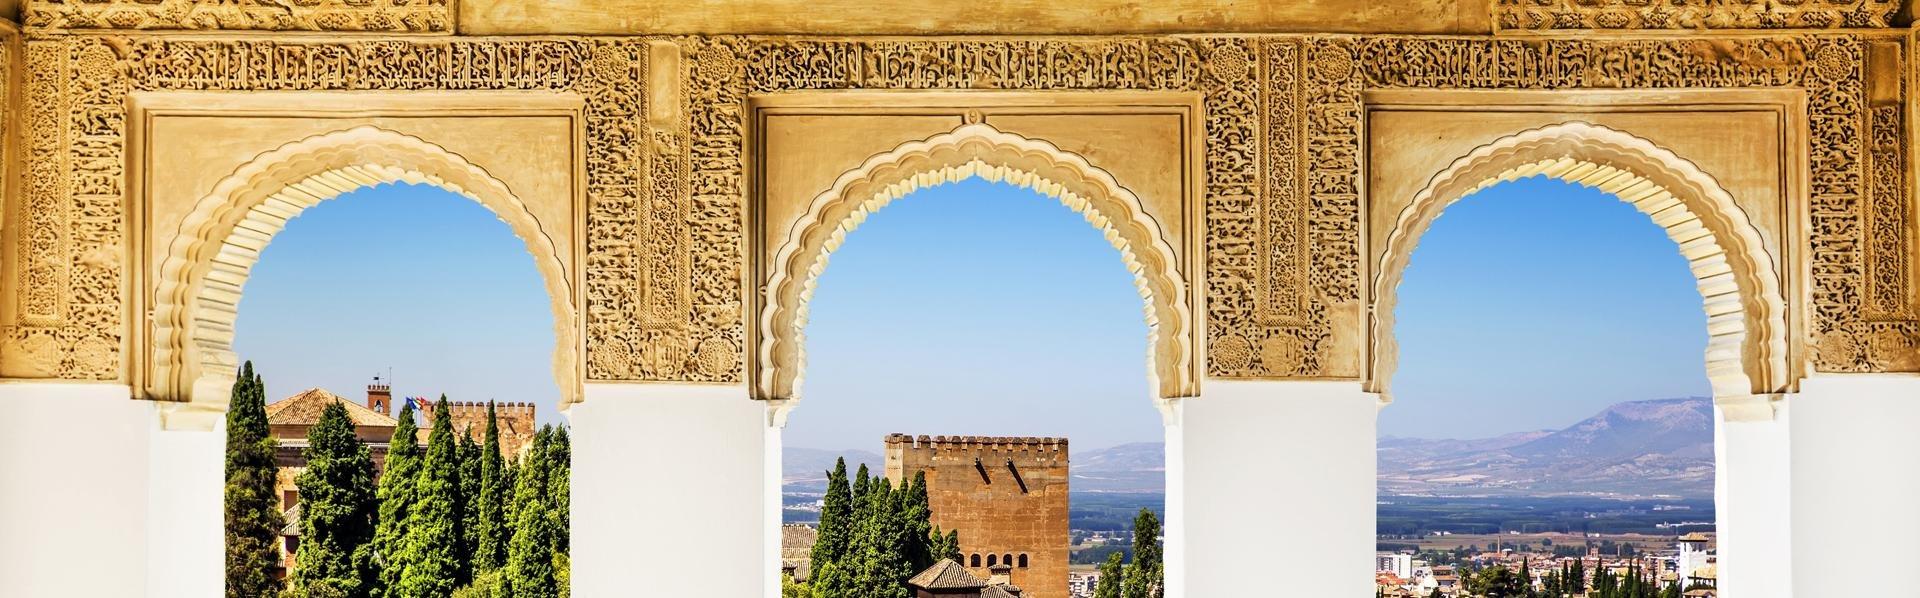 Alhambra, Granada, Andalusië, Spanje